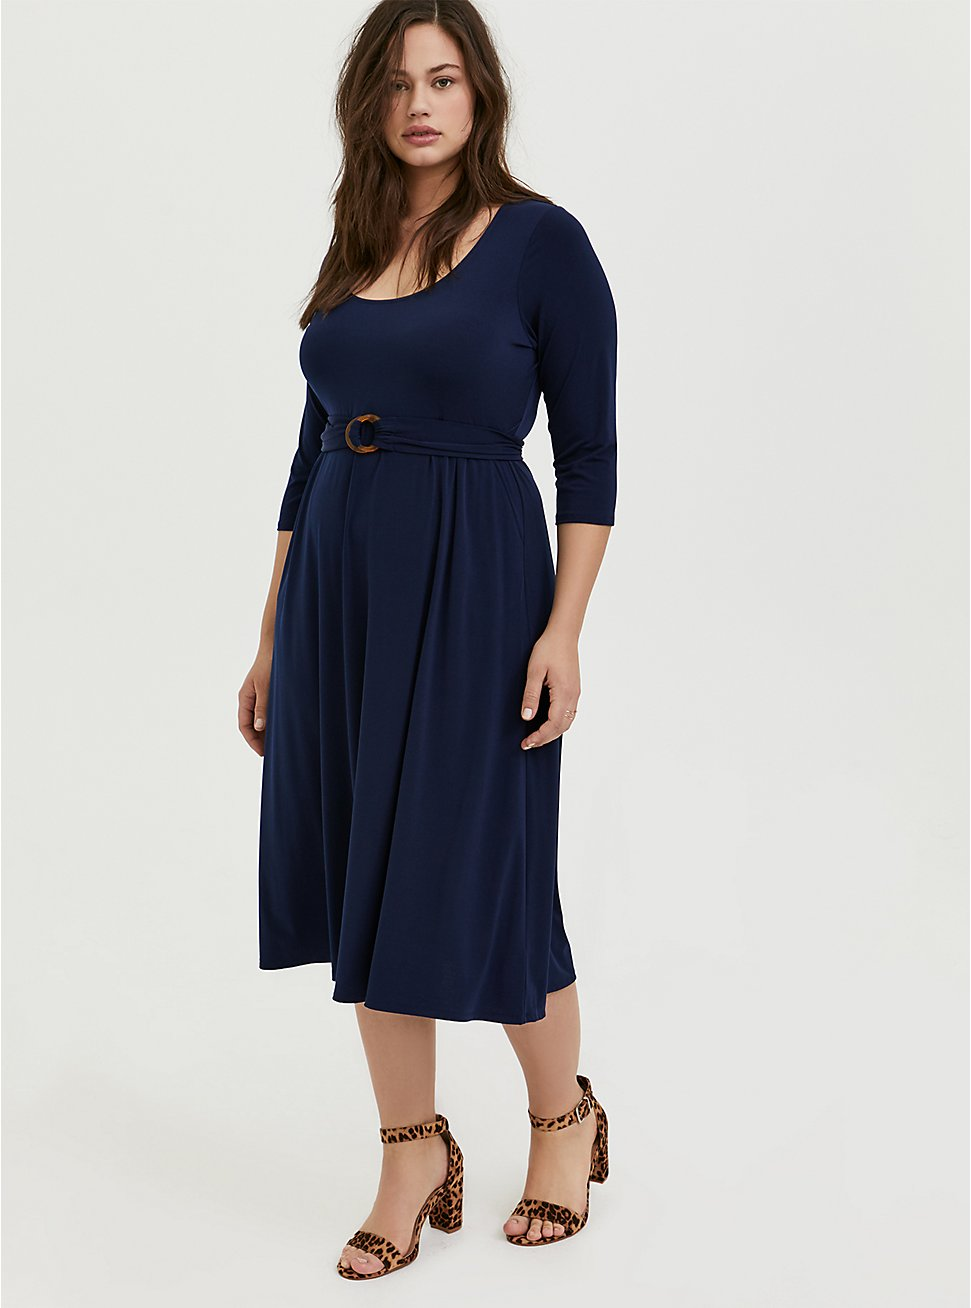 Plus Size Navy Studio Knit Belted Midi Dress, PEACOAT, hi-res